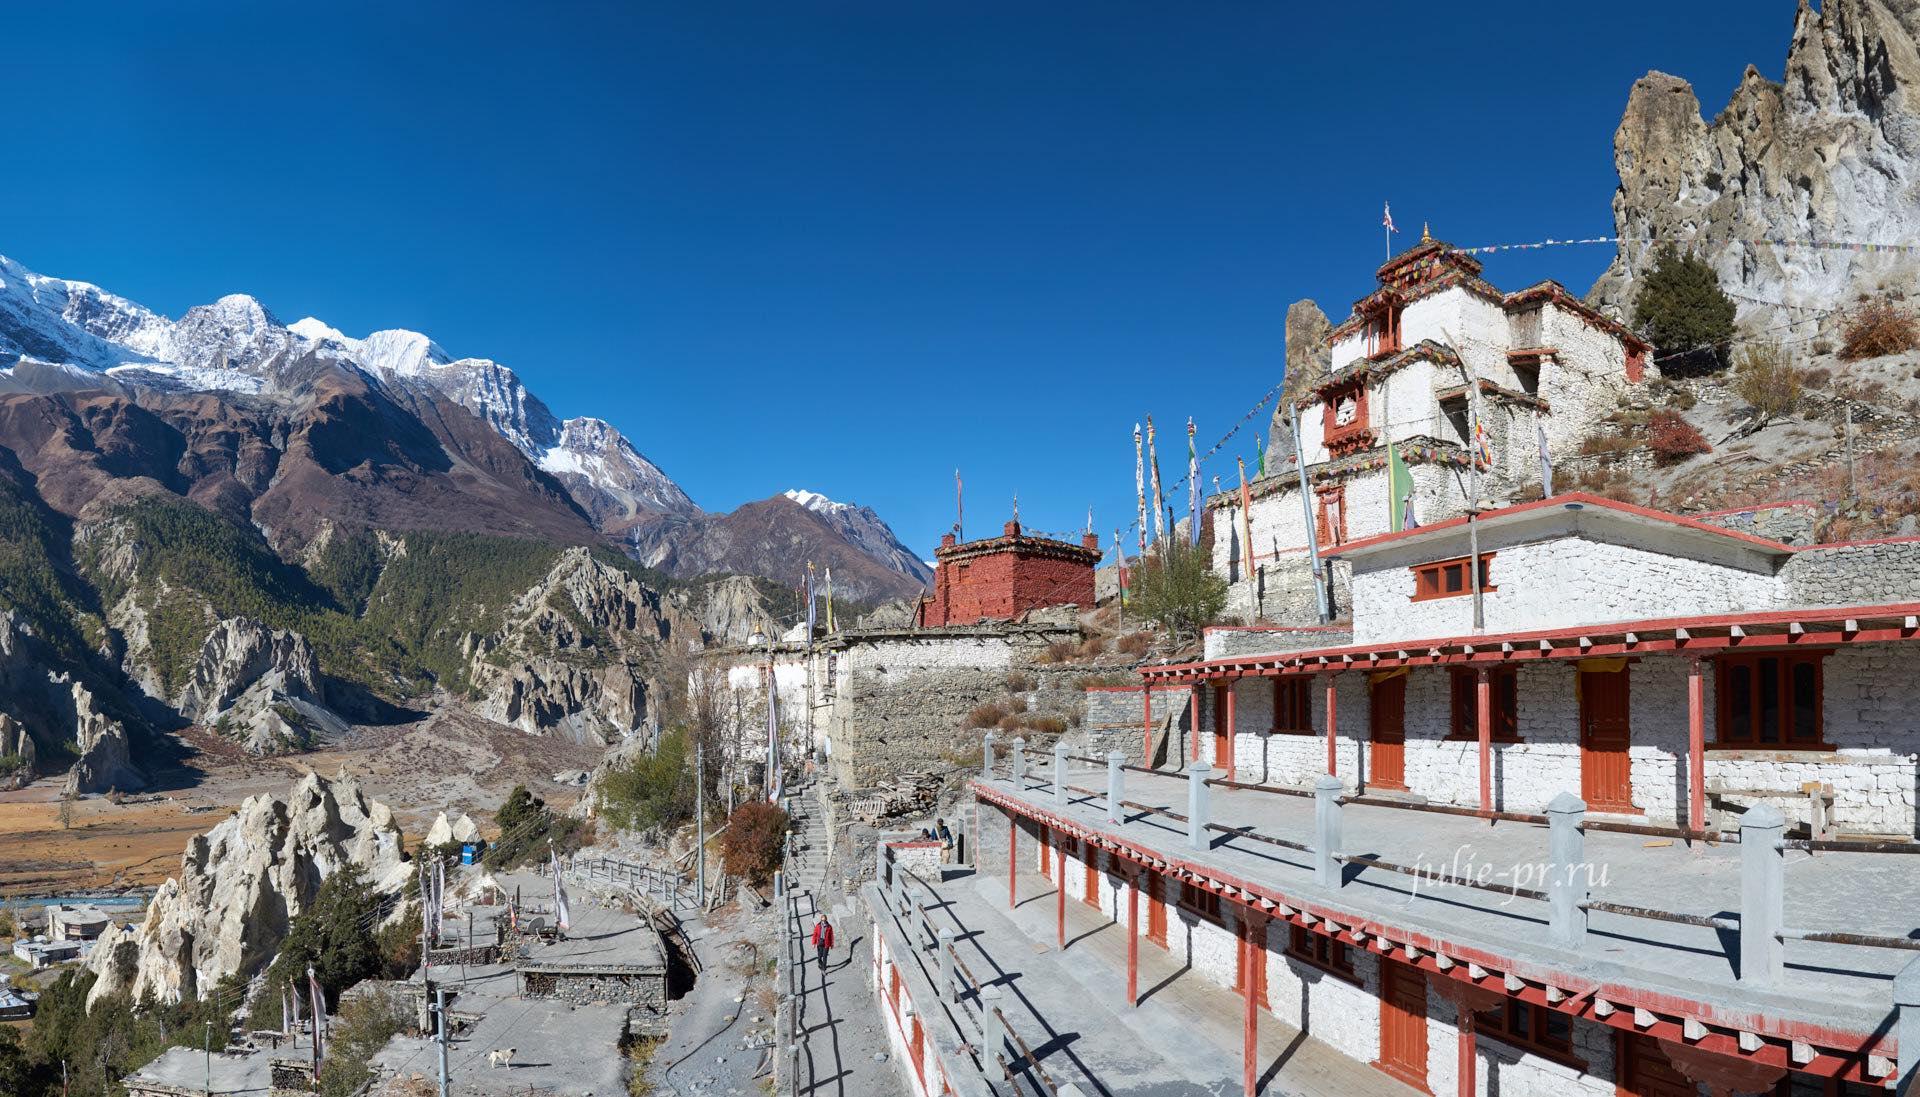 Непал, Трек вокруг Аннапурны, Braka, Монастырь